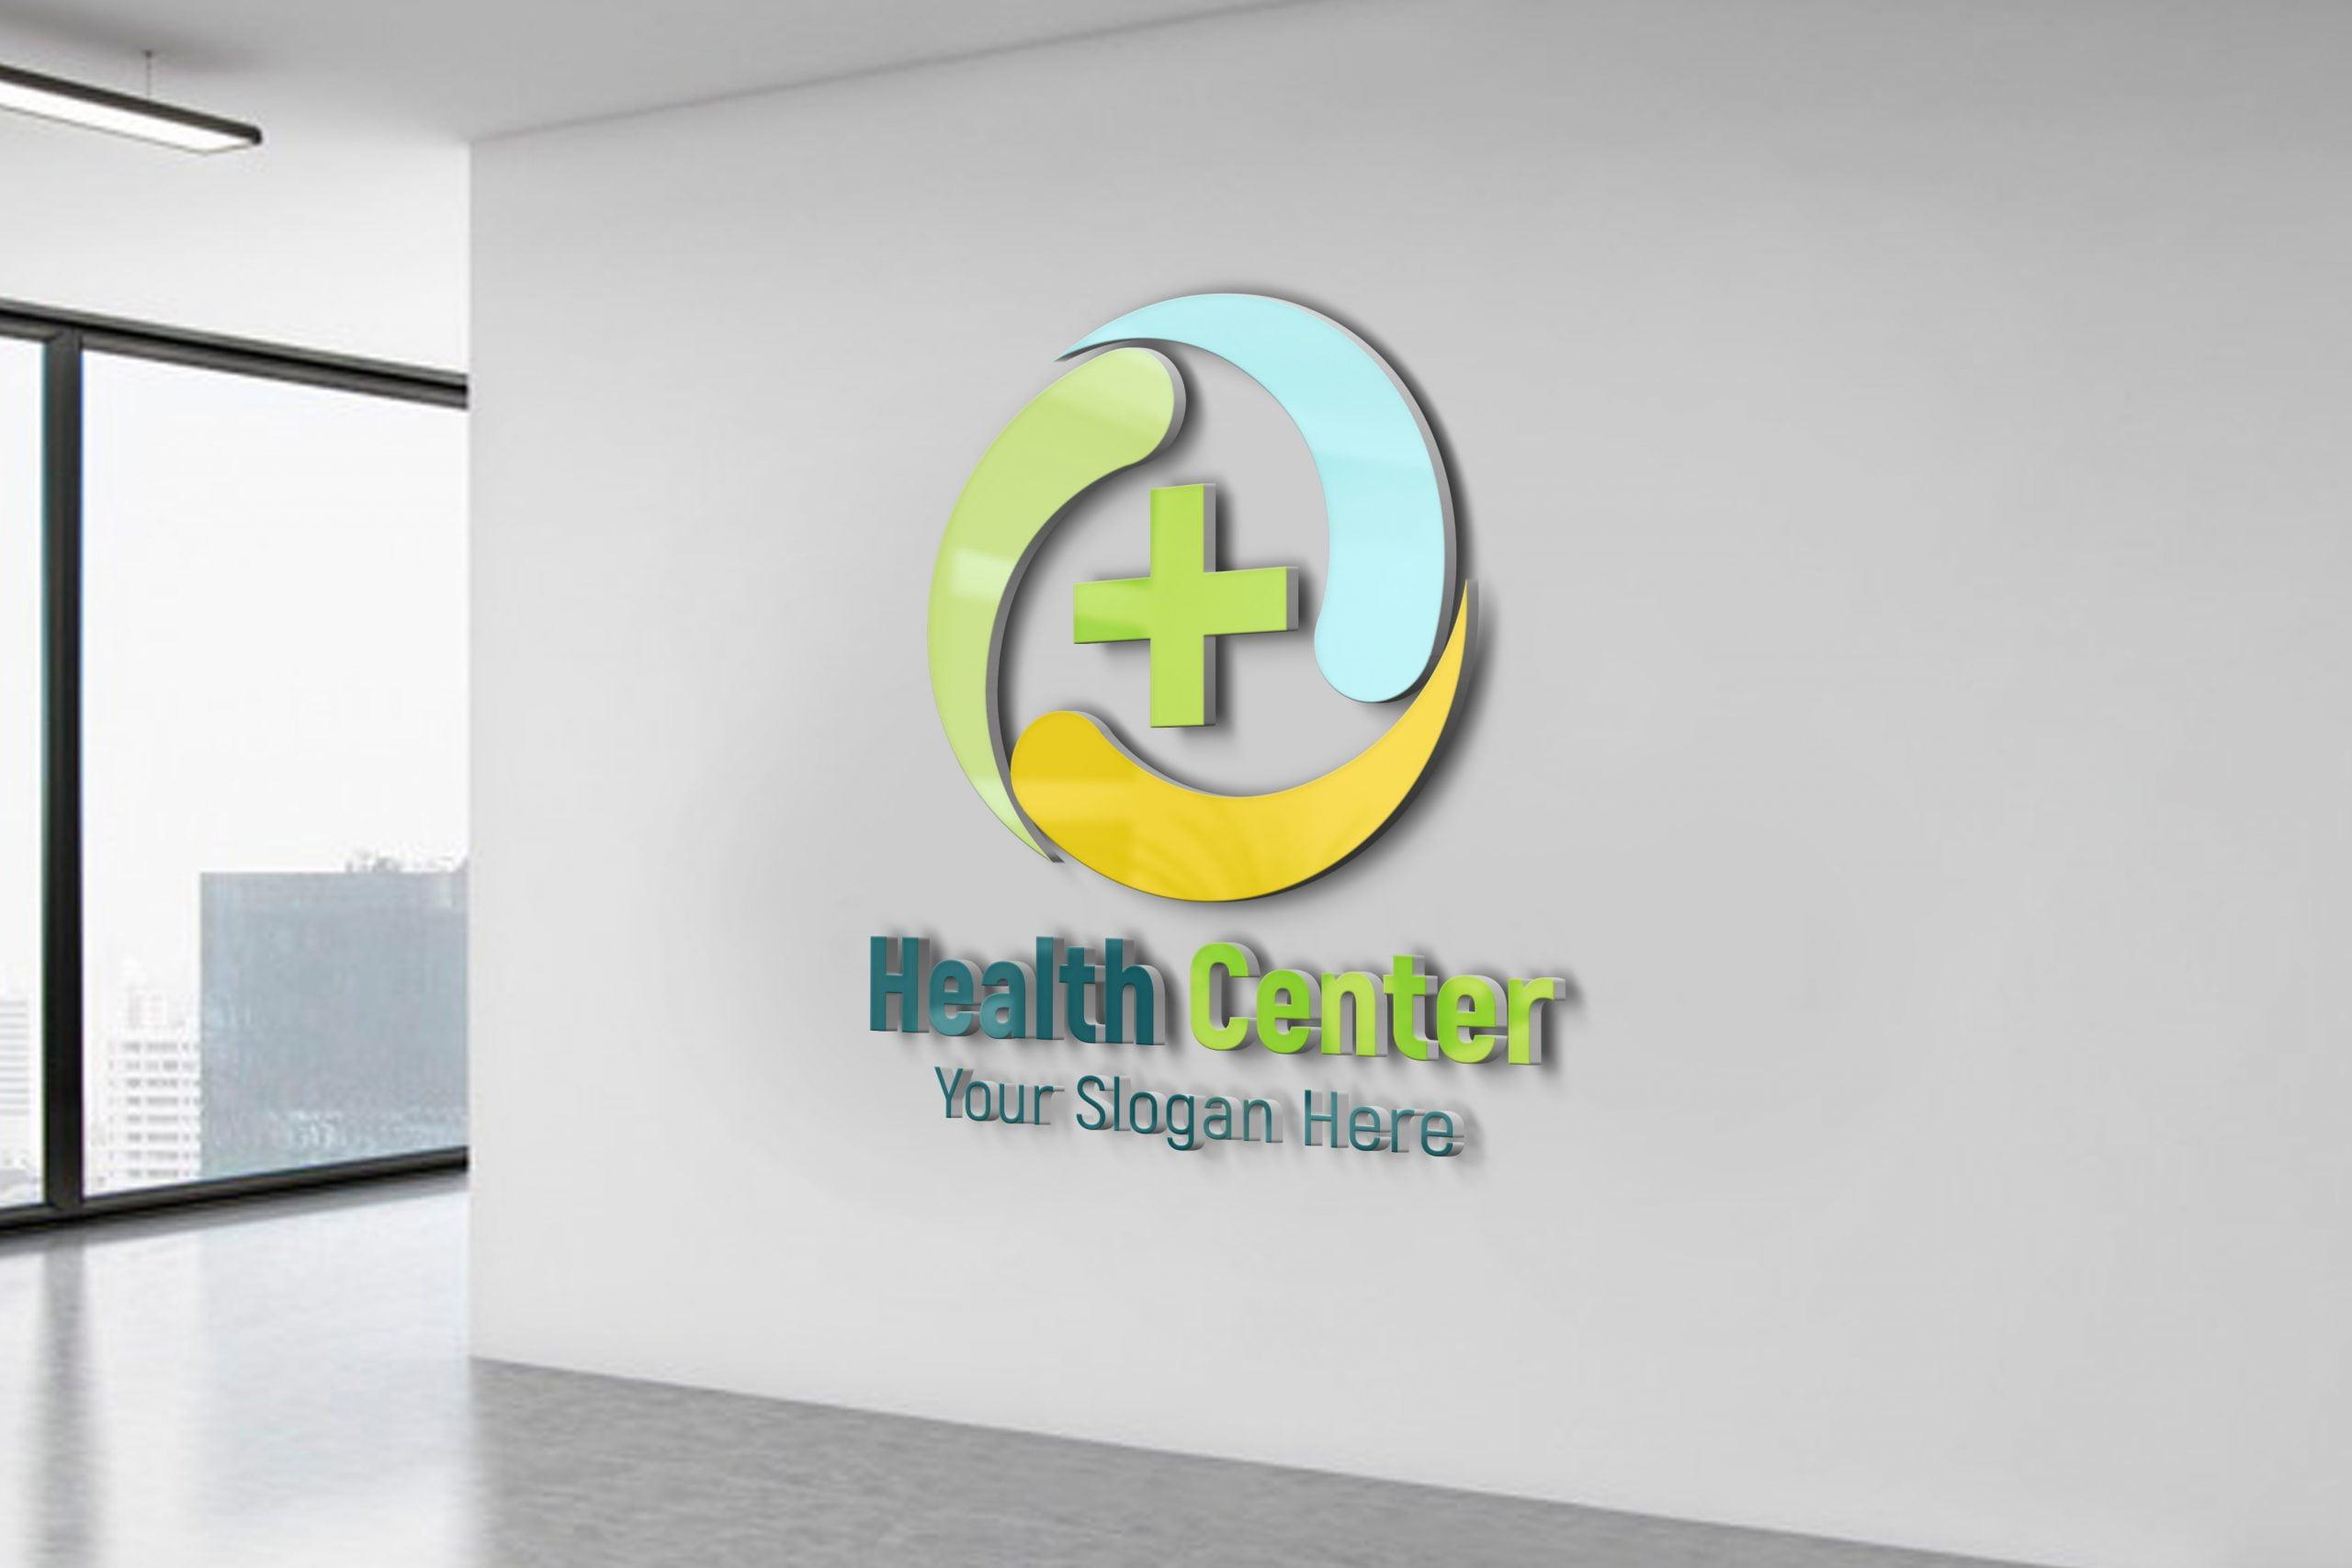 Health care medical logo Design 3d office wall